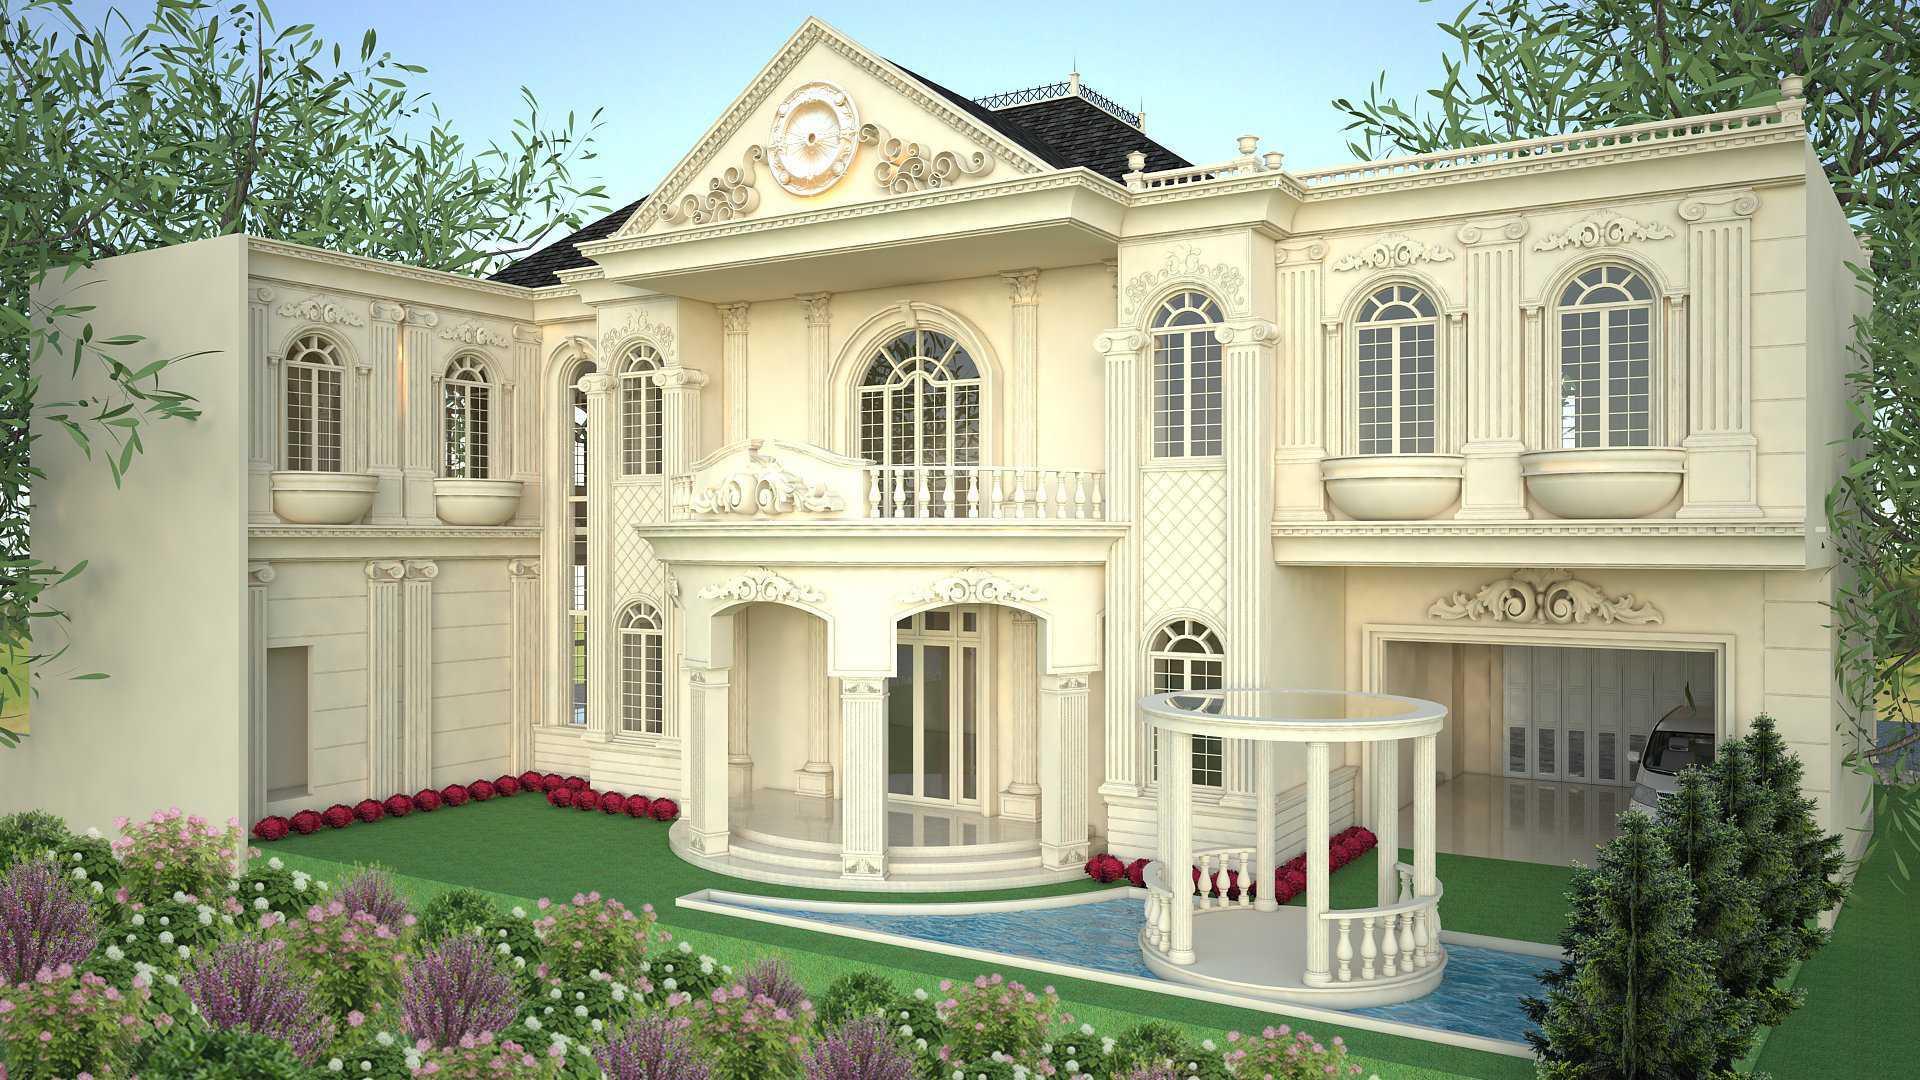 Arsindo Cipta Karya Classic House Project Cimahi Bandung Bandung Bandung 6-Copy Klasik  26833